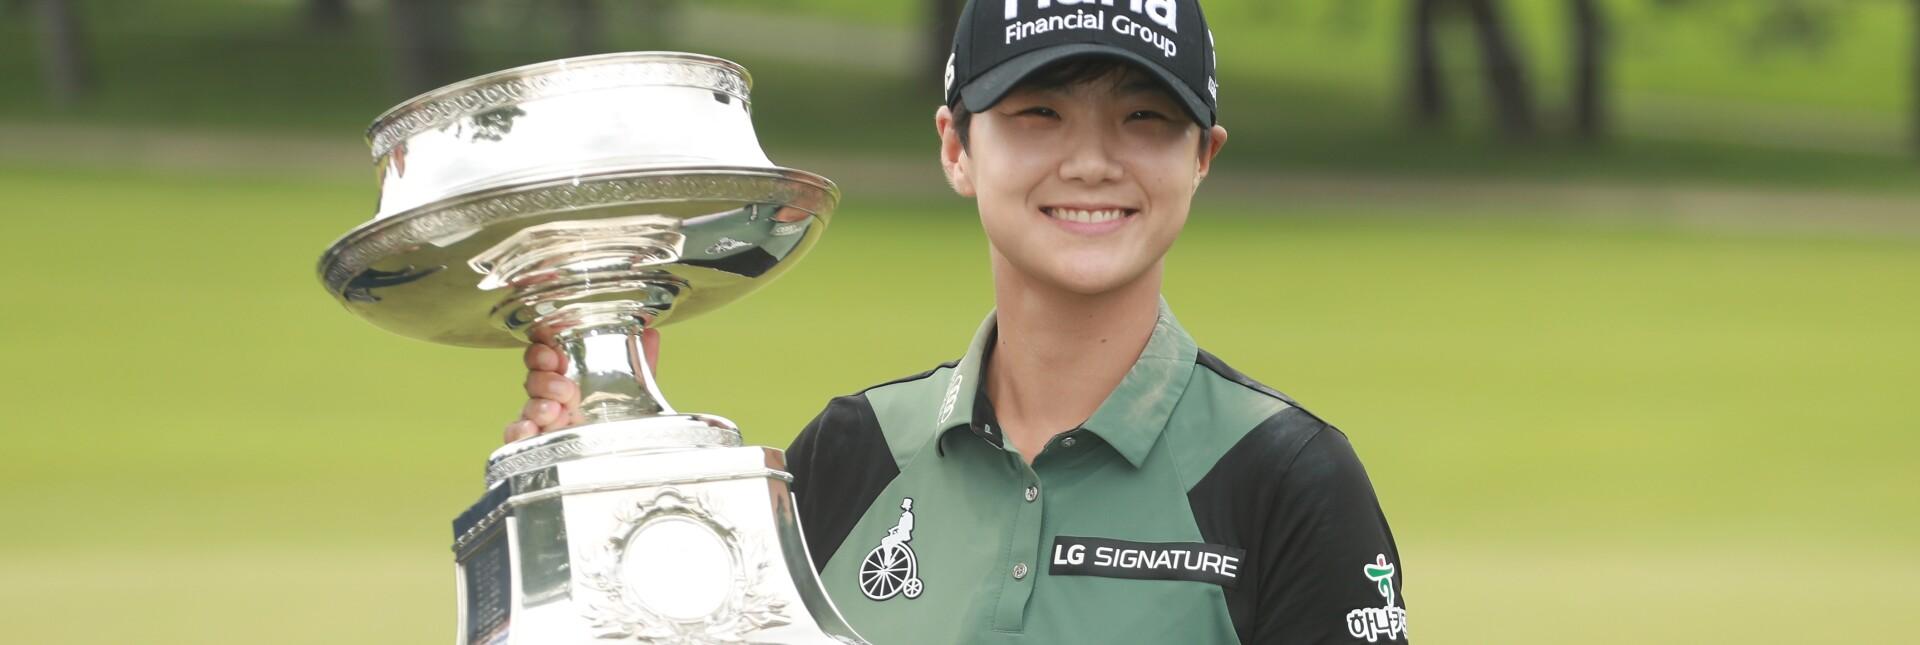 KPMG Women's PGA Championship - Final Round